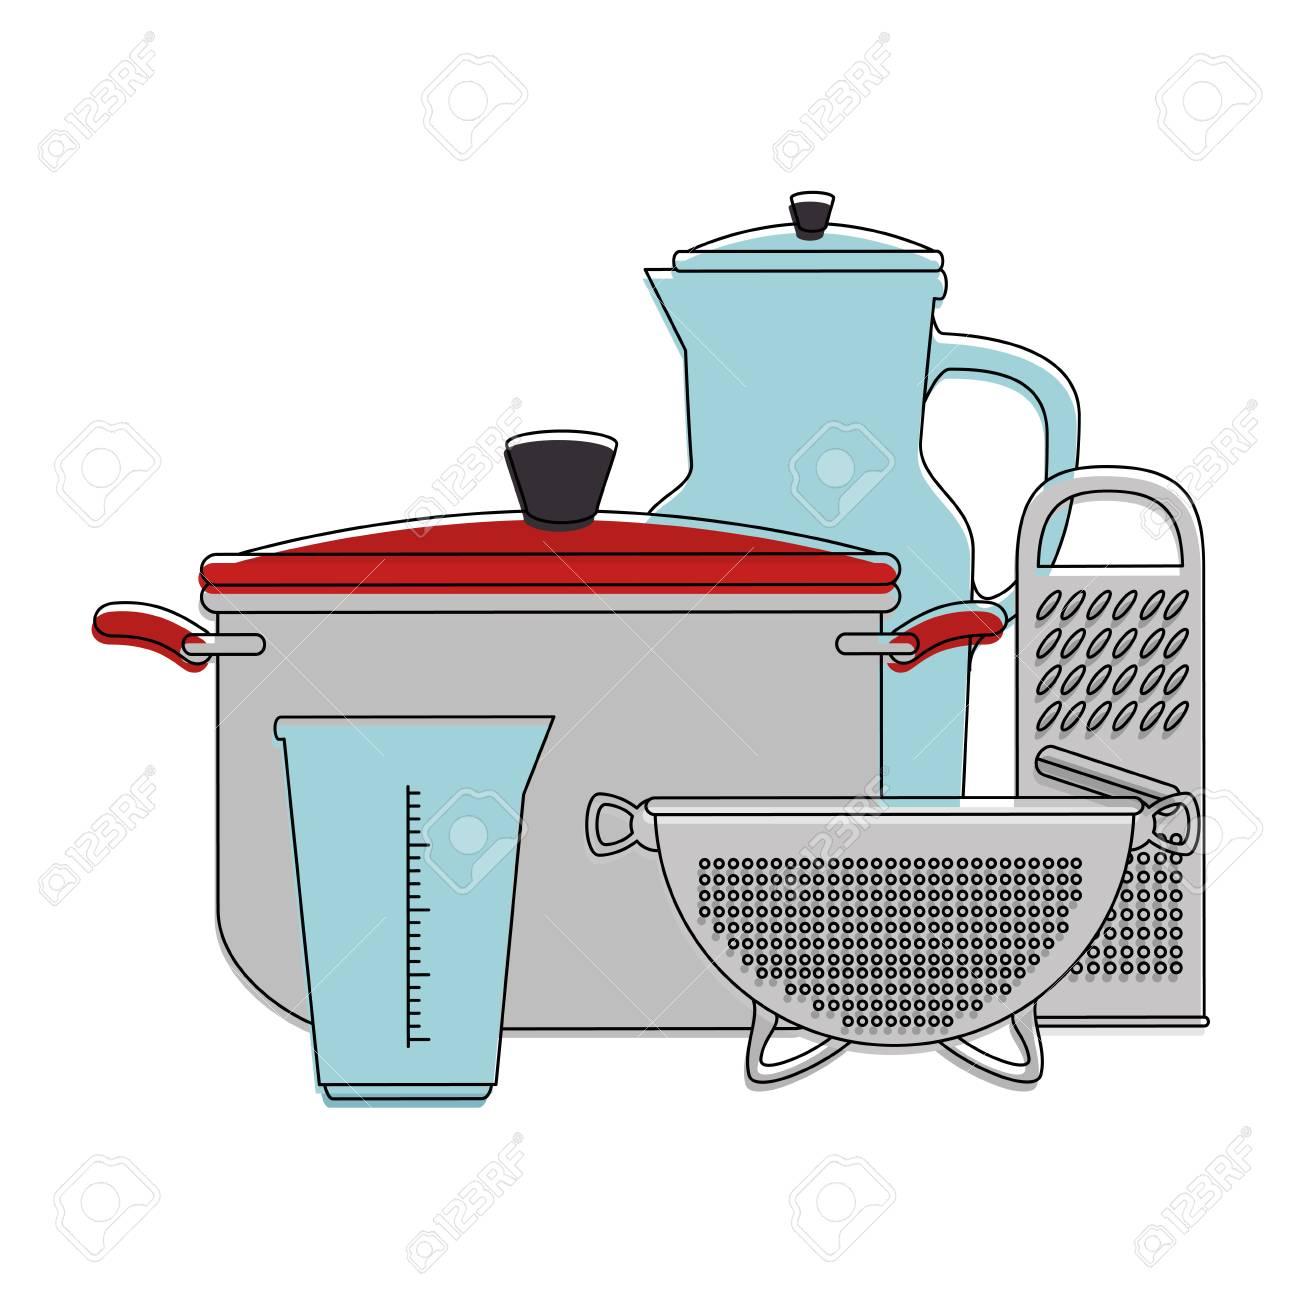 banque d images ensemble de recipients de cuisine vector illustration design